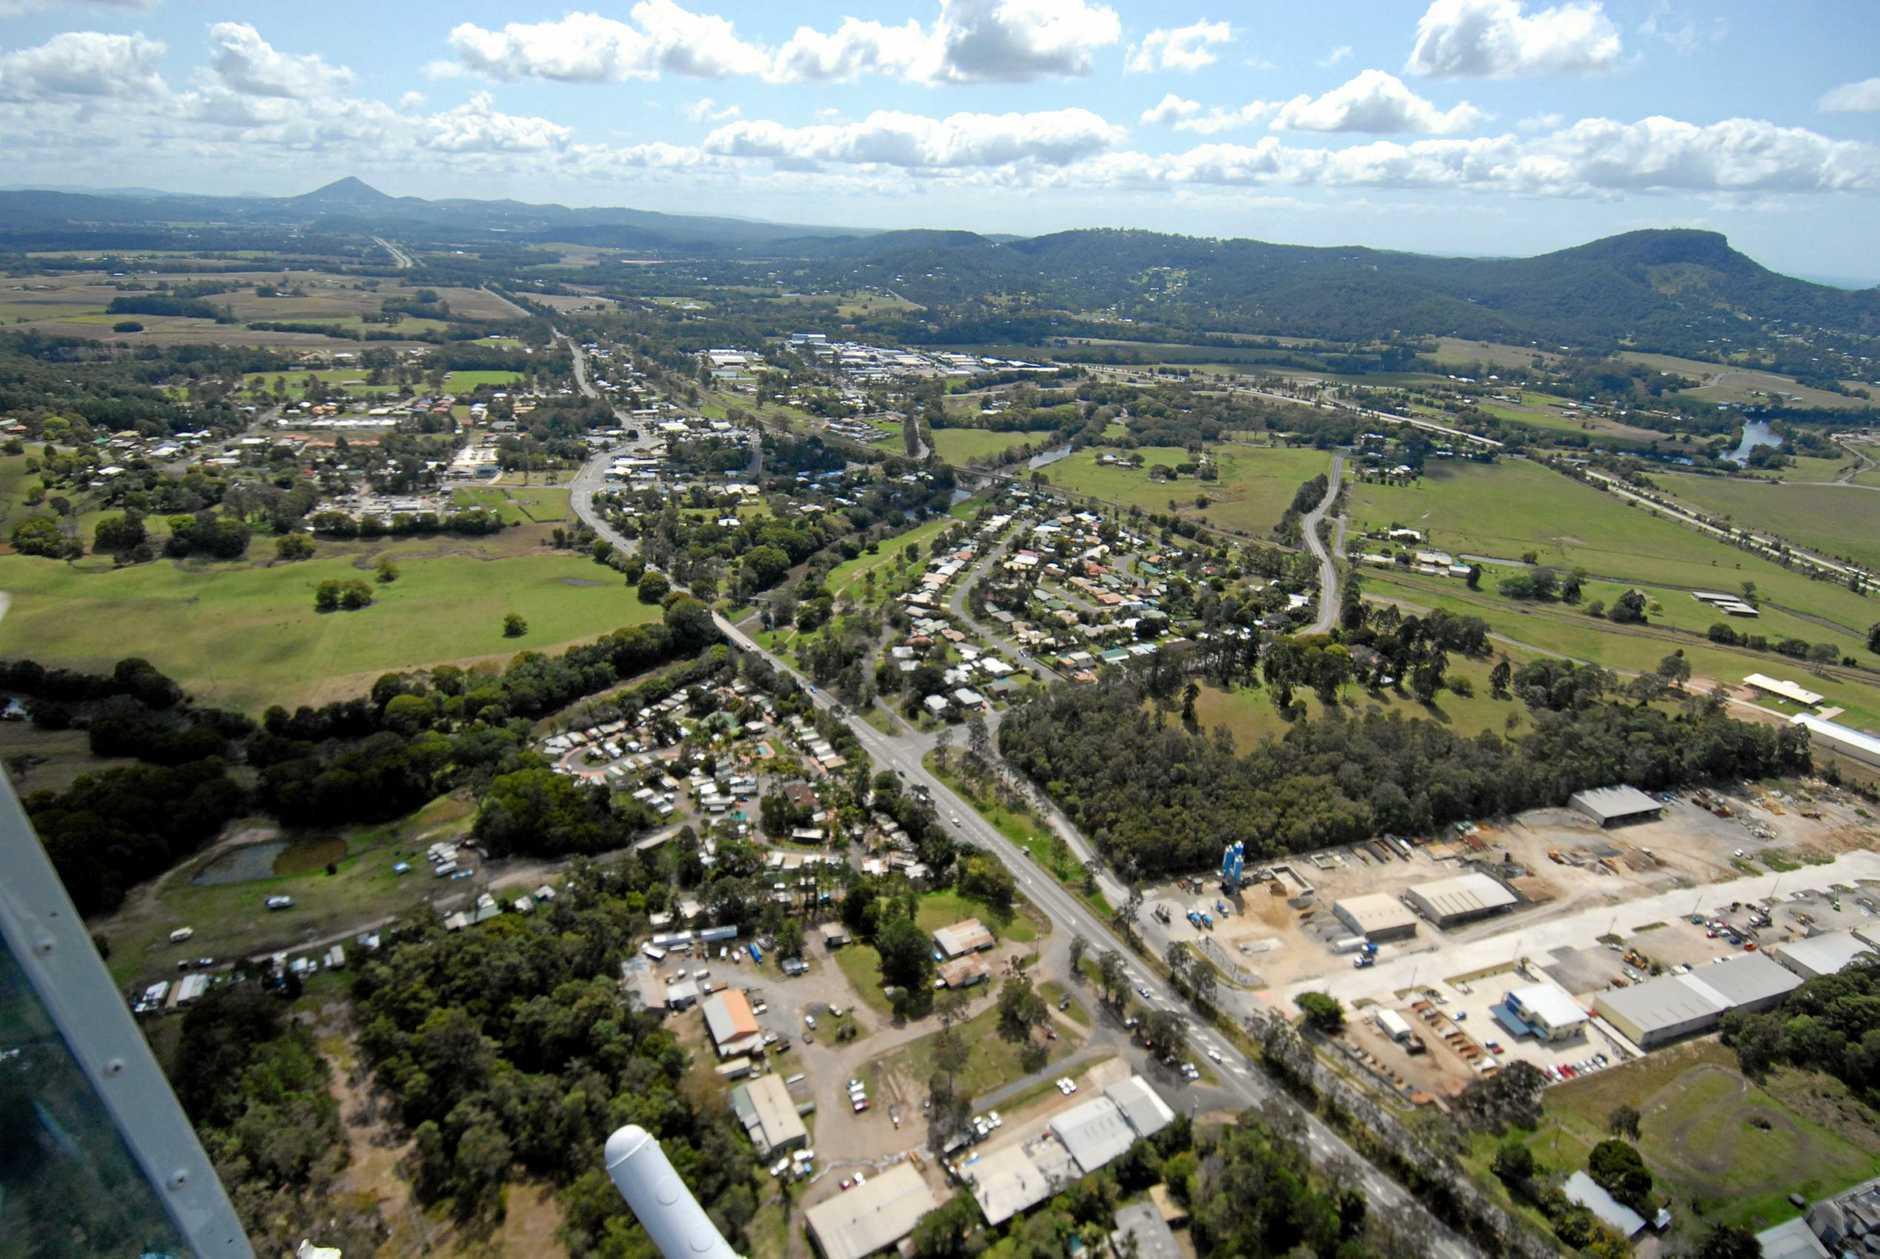 11/09/07       168853a8Aerial photos of the Sunshine Coast.YandinaPhoto Warren Lynam